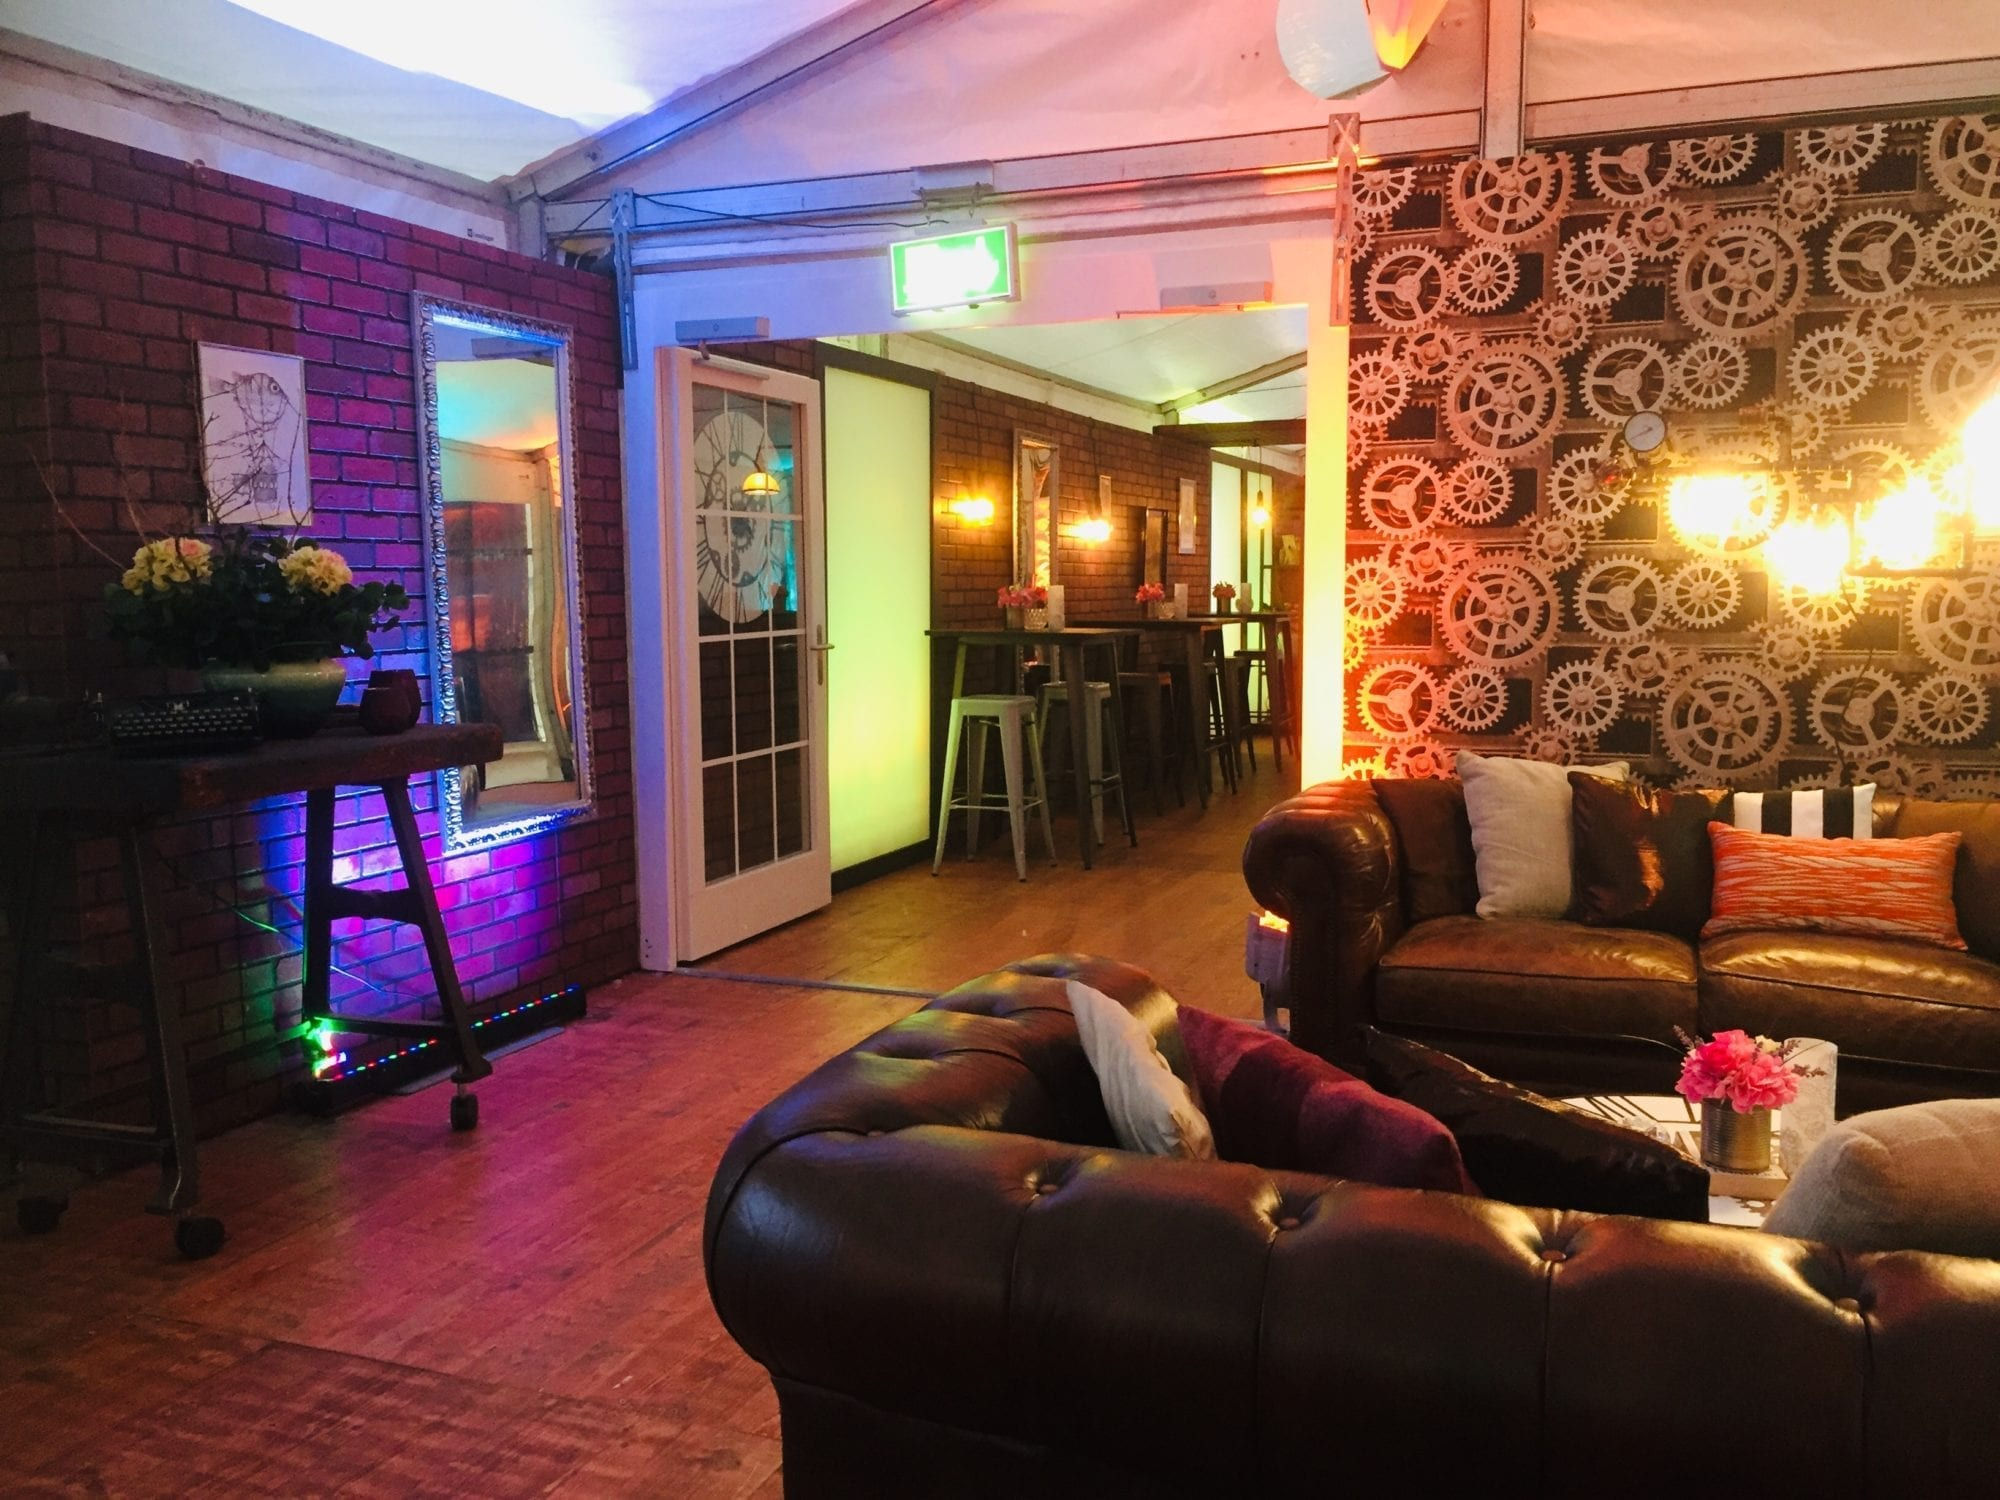 chesterfield vintage 3er sofa mieten rent-a-lounge 2